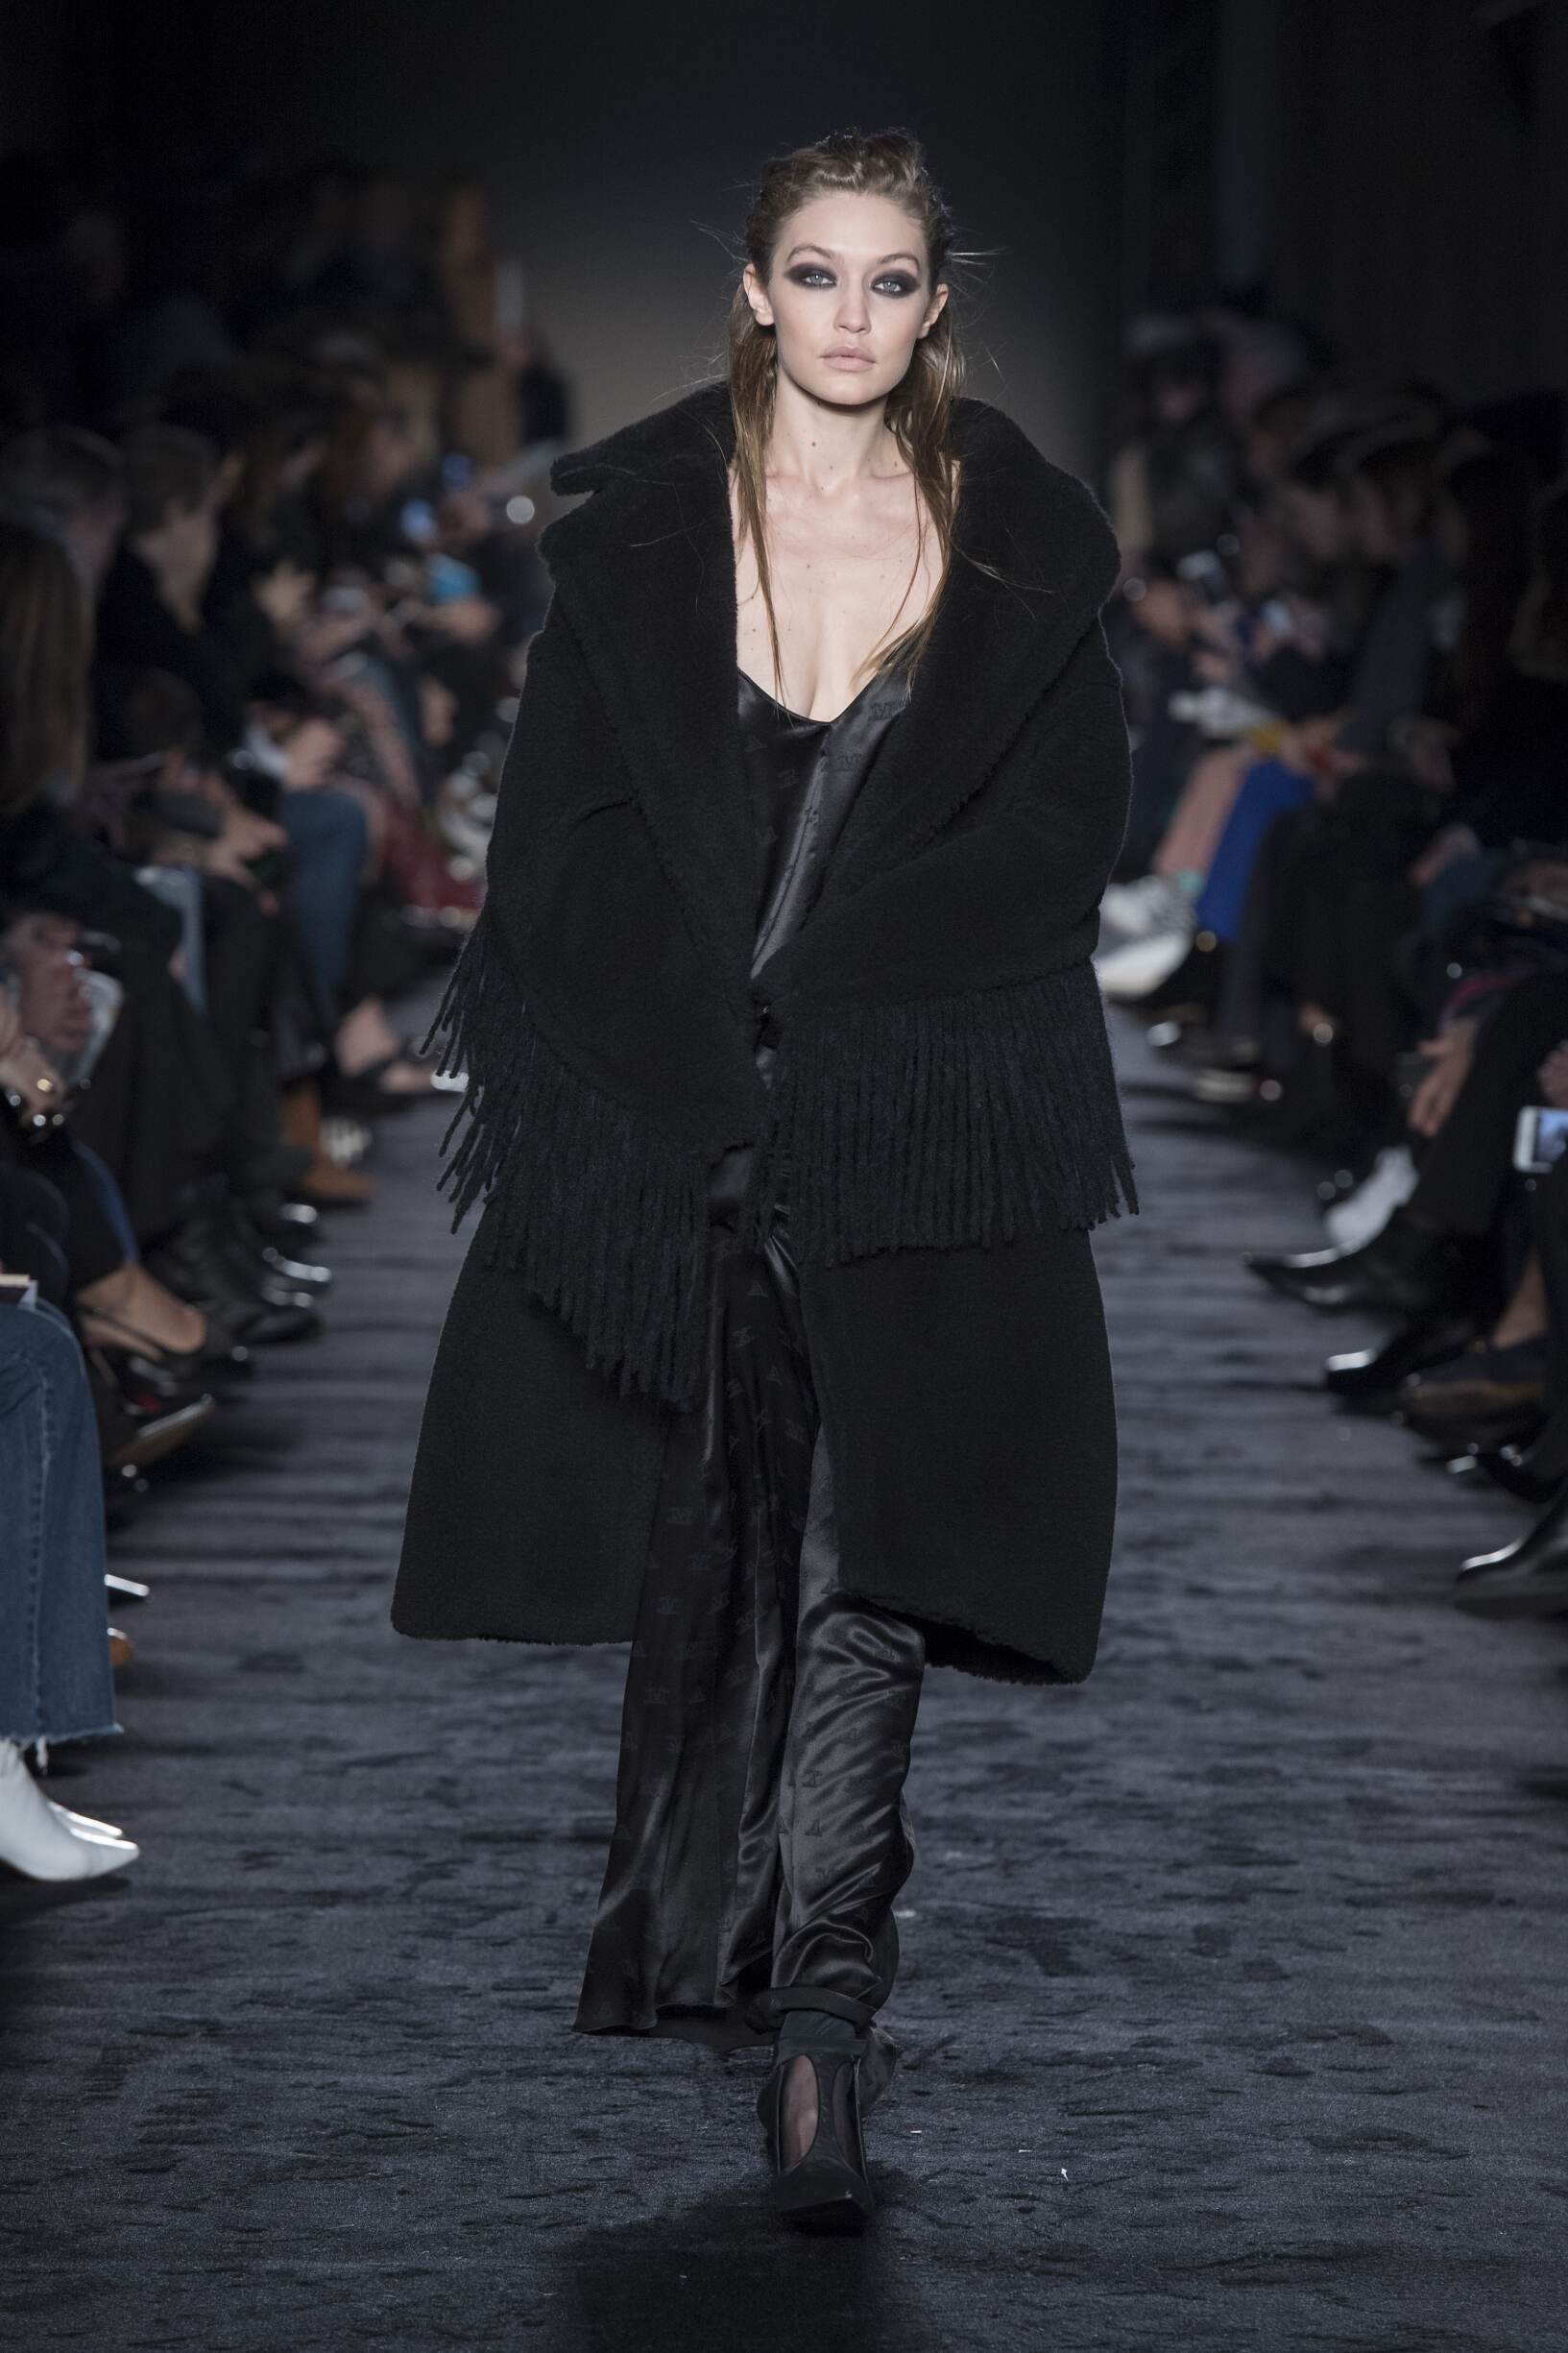 Fashion 2018-19 Woman Trends Max Mara